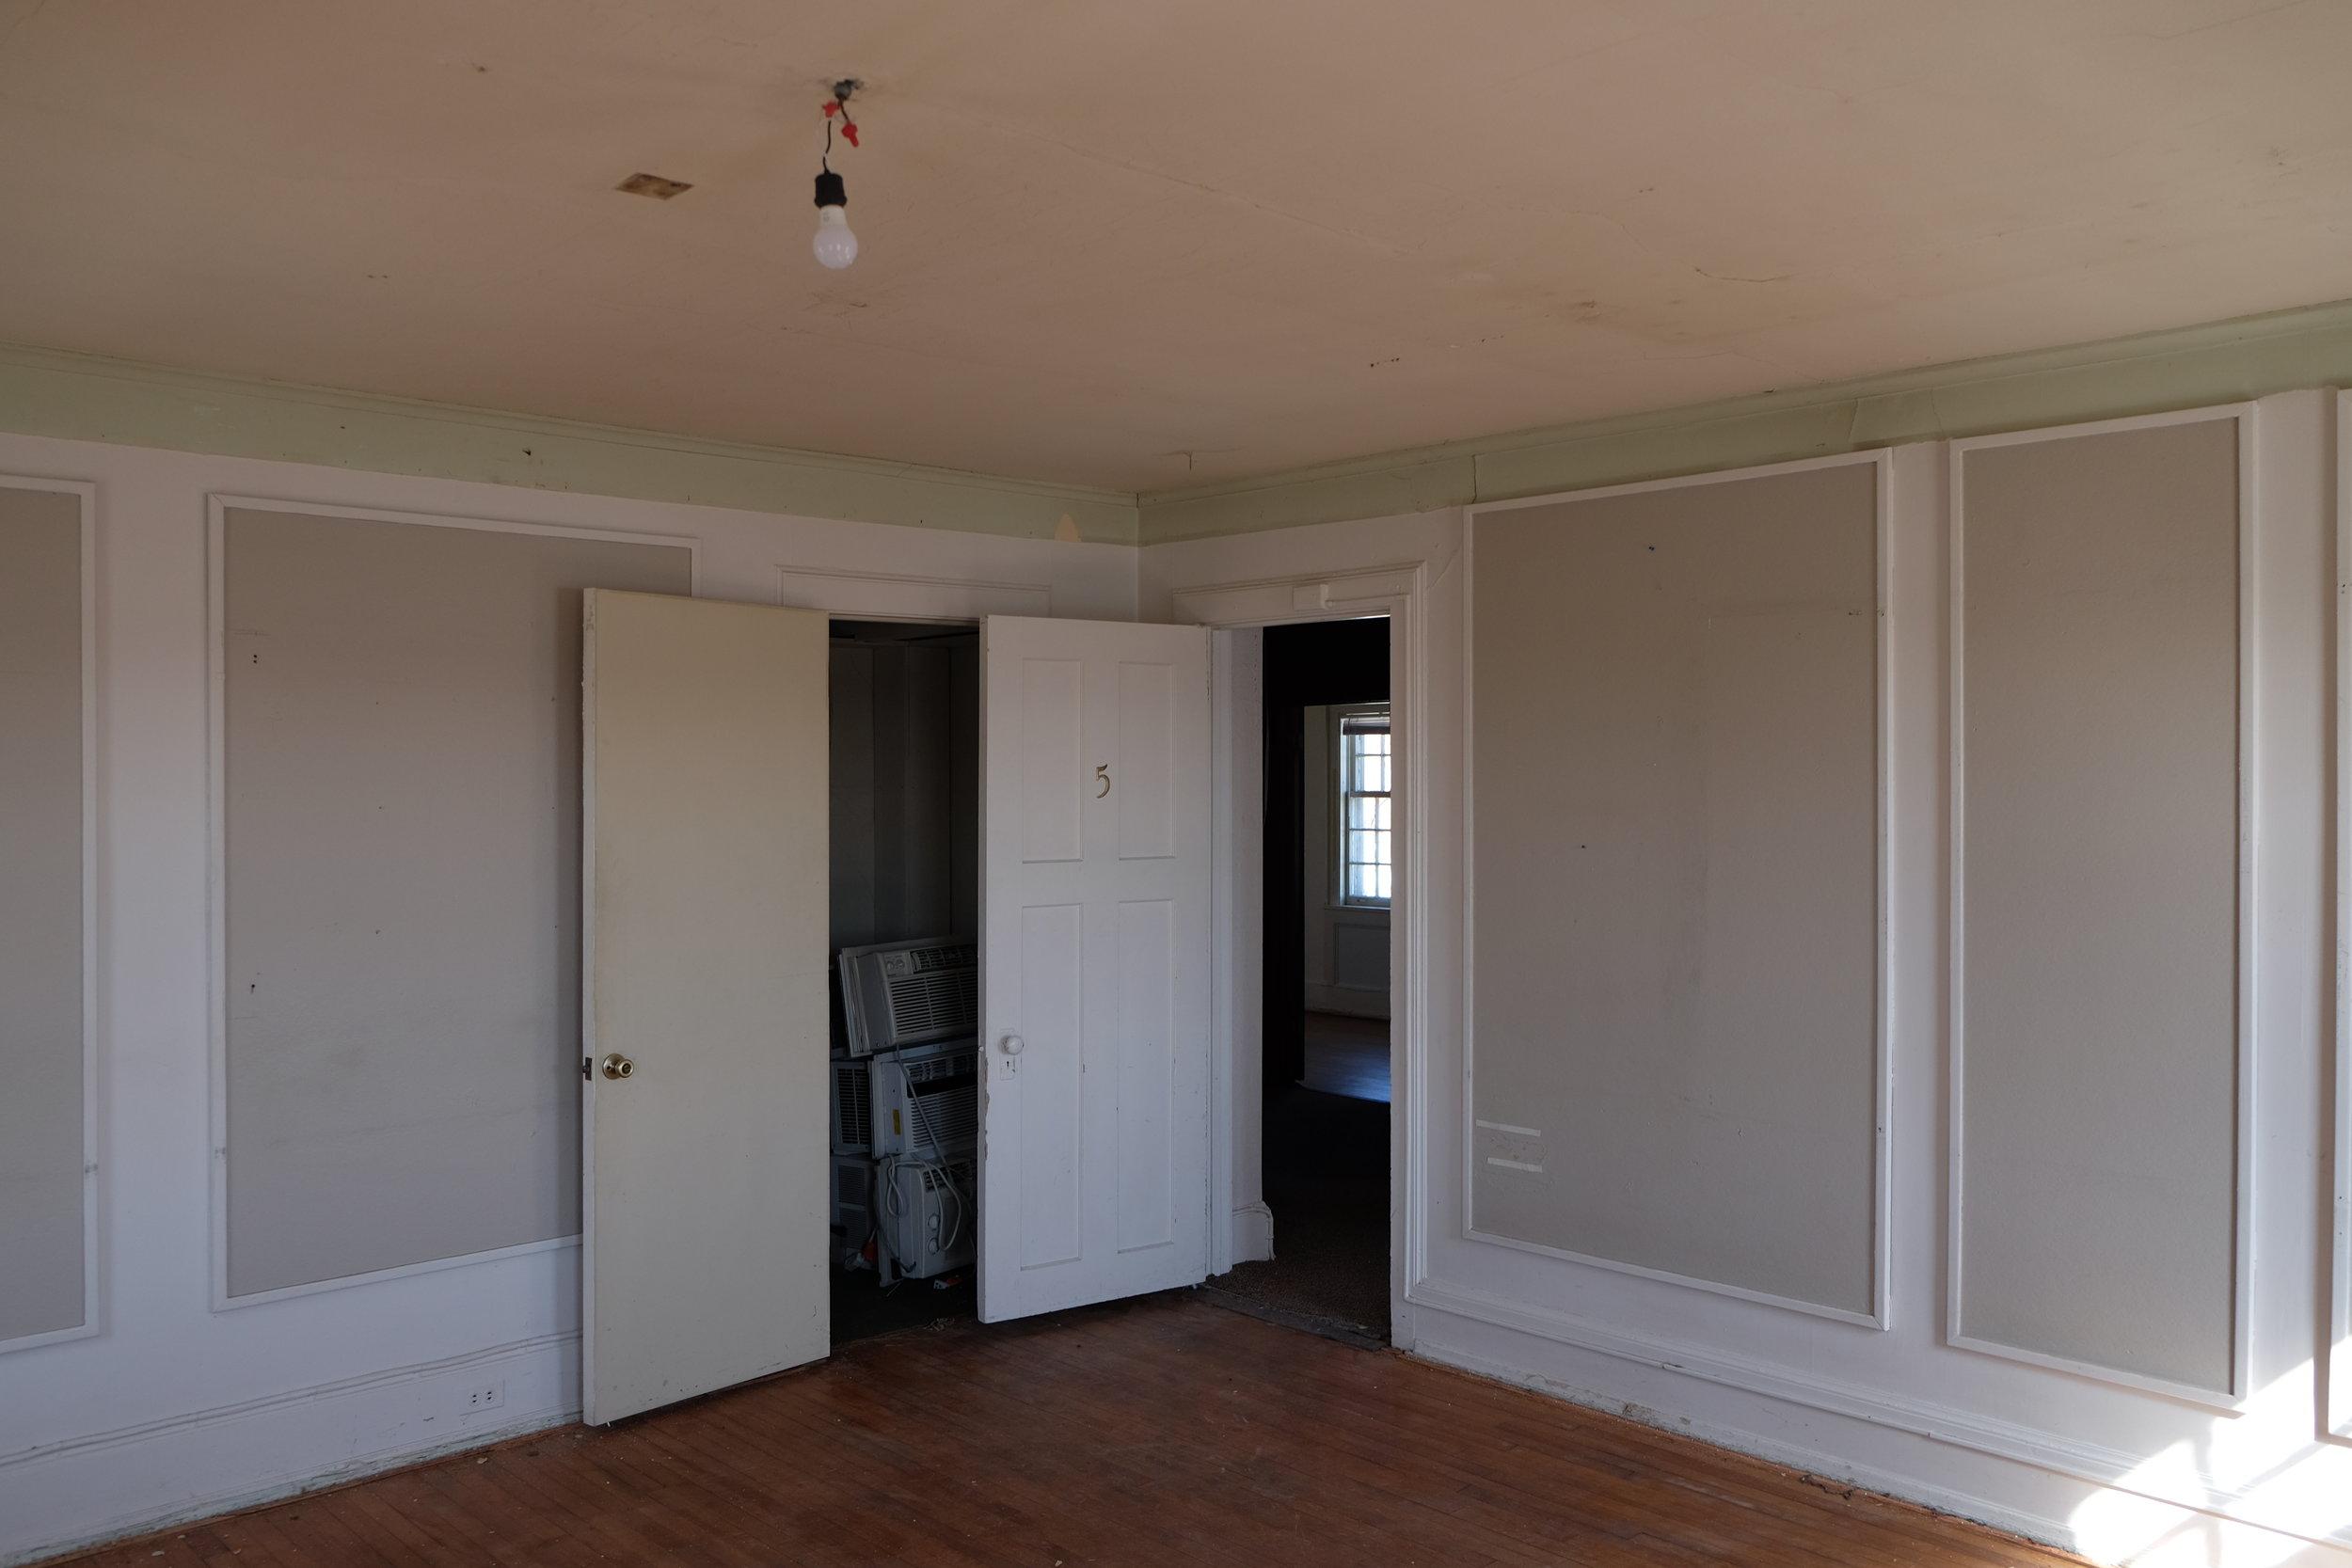 Maison Bodega upstairsbedroom.JPG